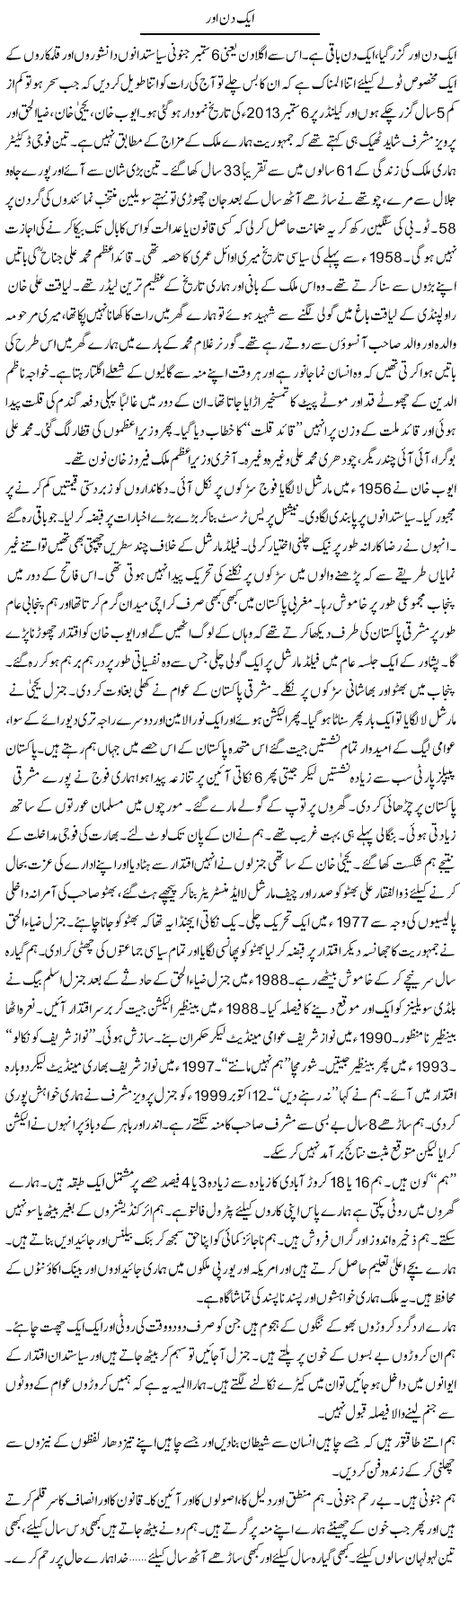 Junooni anti-democracy elite of Pakistan - Abbas Athar